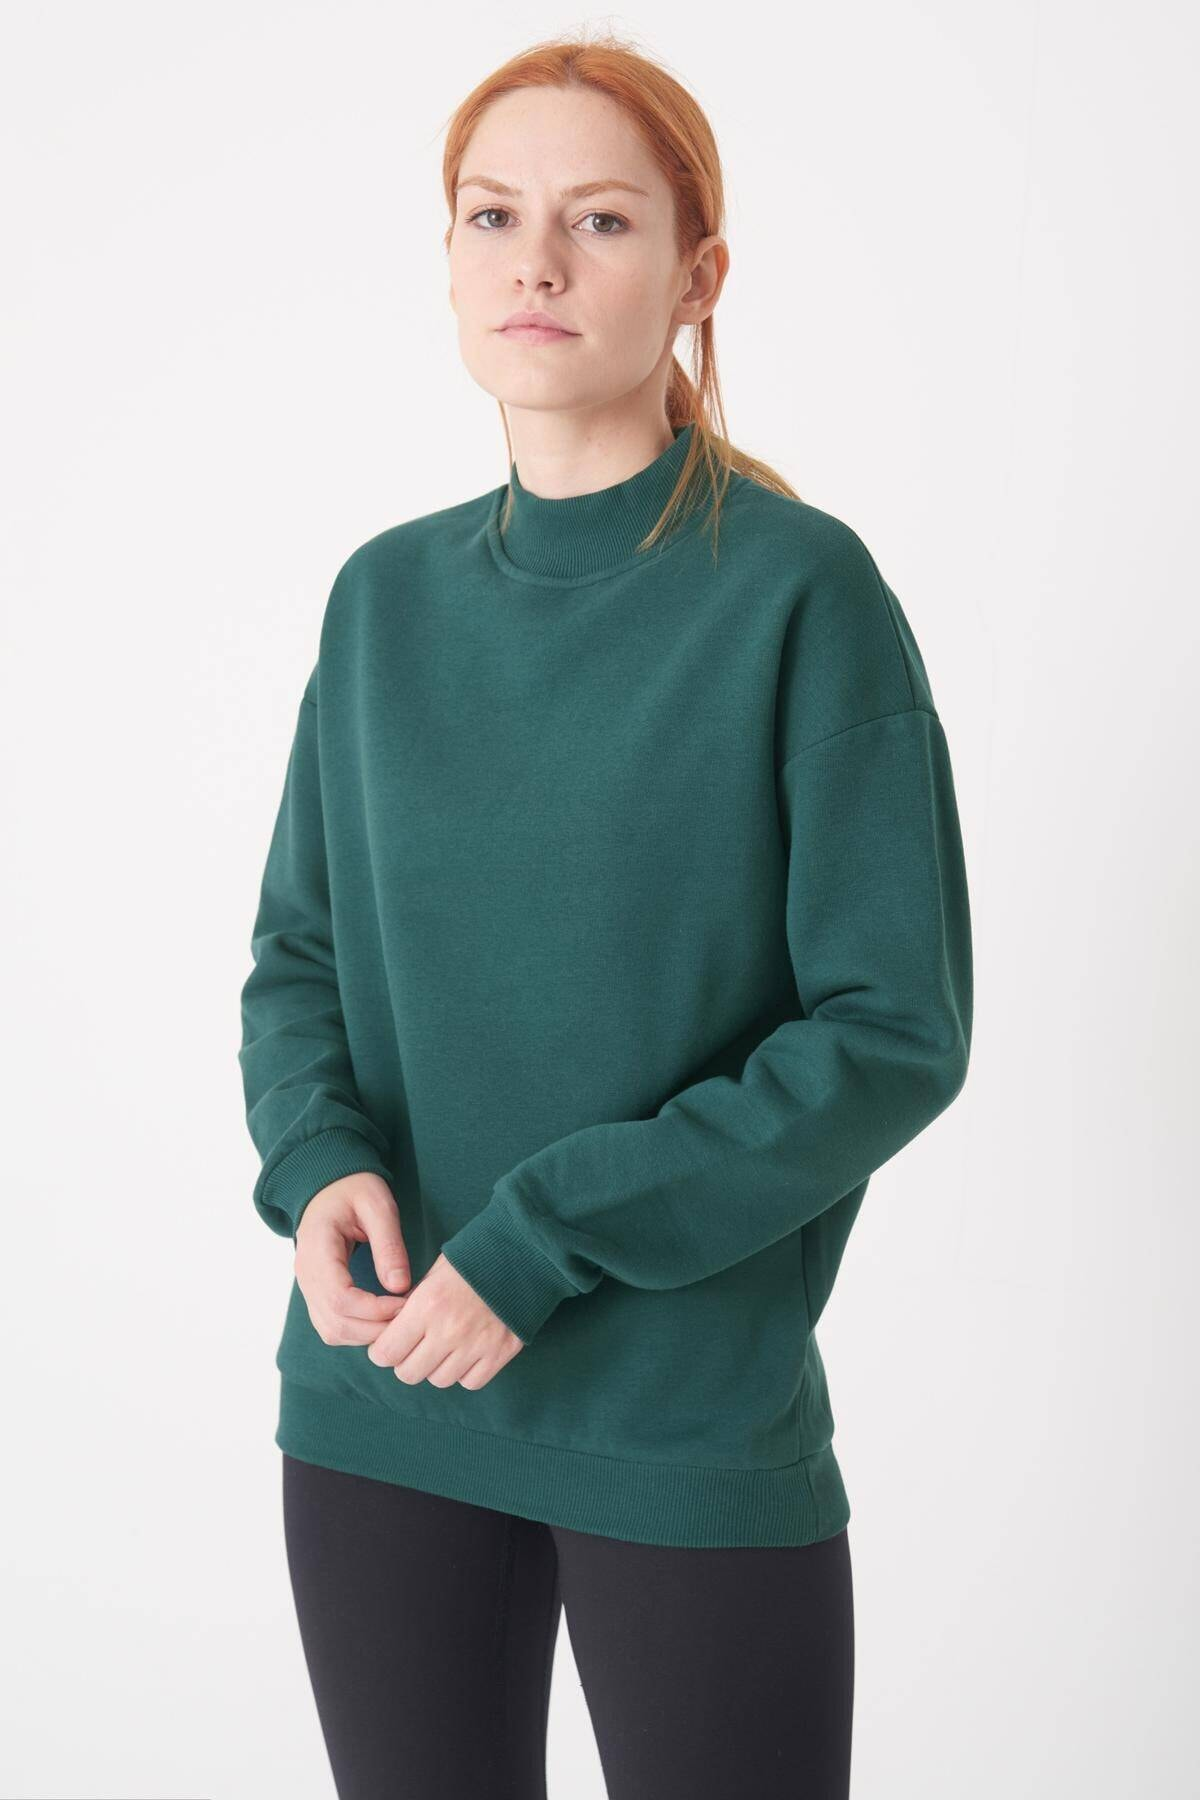 Addax Kadın Koyu Yeşil Yarım Balıkçı Yaka Sweat S8606 - I4 - I5 ADX-0000019754 1